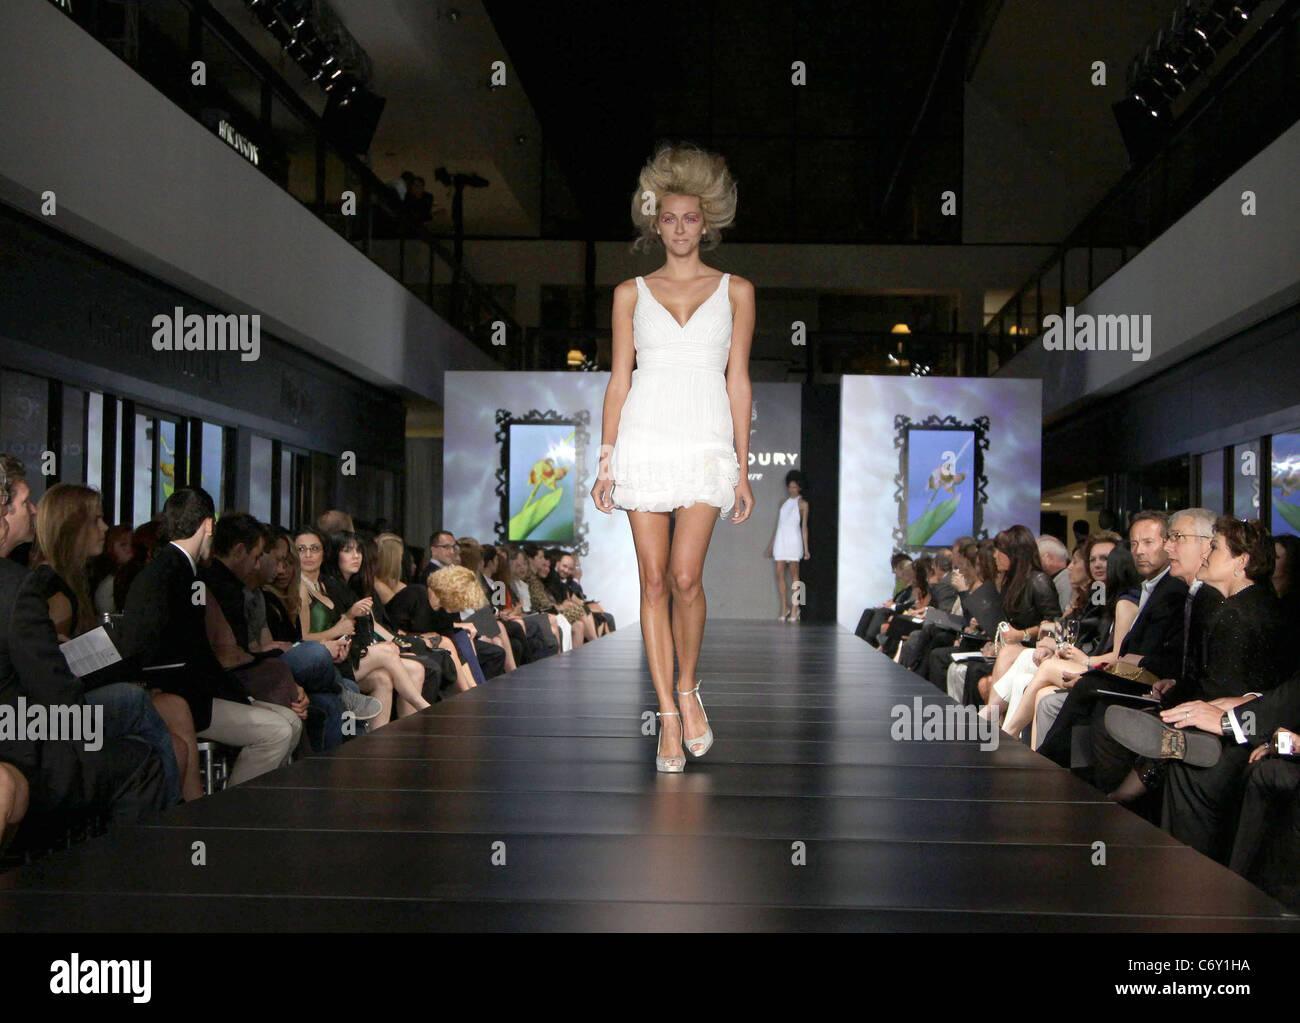 Model Fashion Designer Gilbert Chagoury Hosts His First Ever Runway Stock Photo Alamy